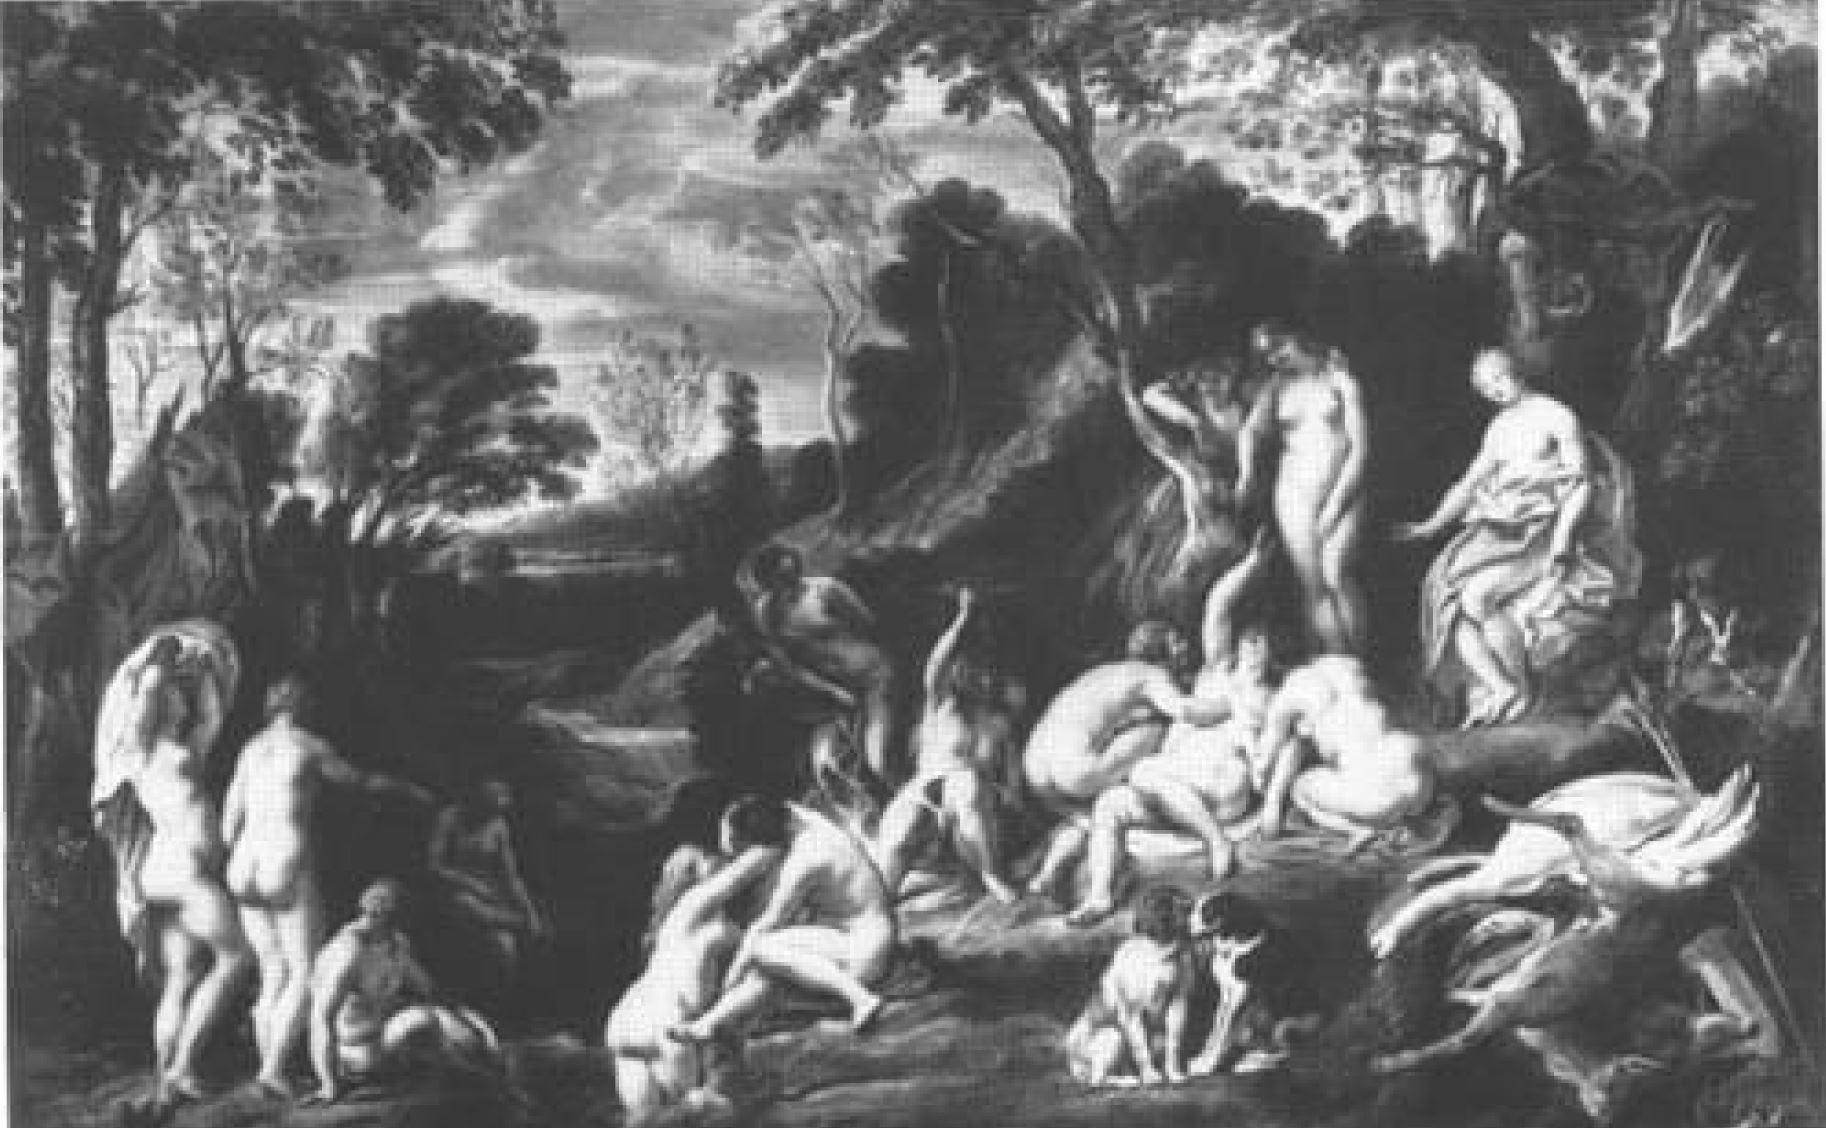 Jordaens 1640 ca Diane et Calisto coll priv 81 x 119,6 cm